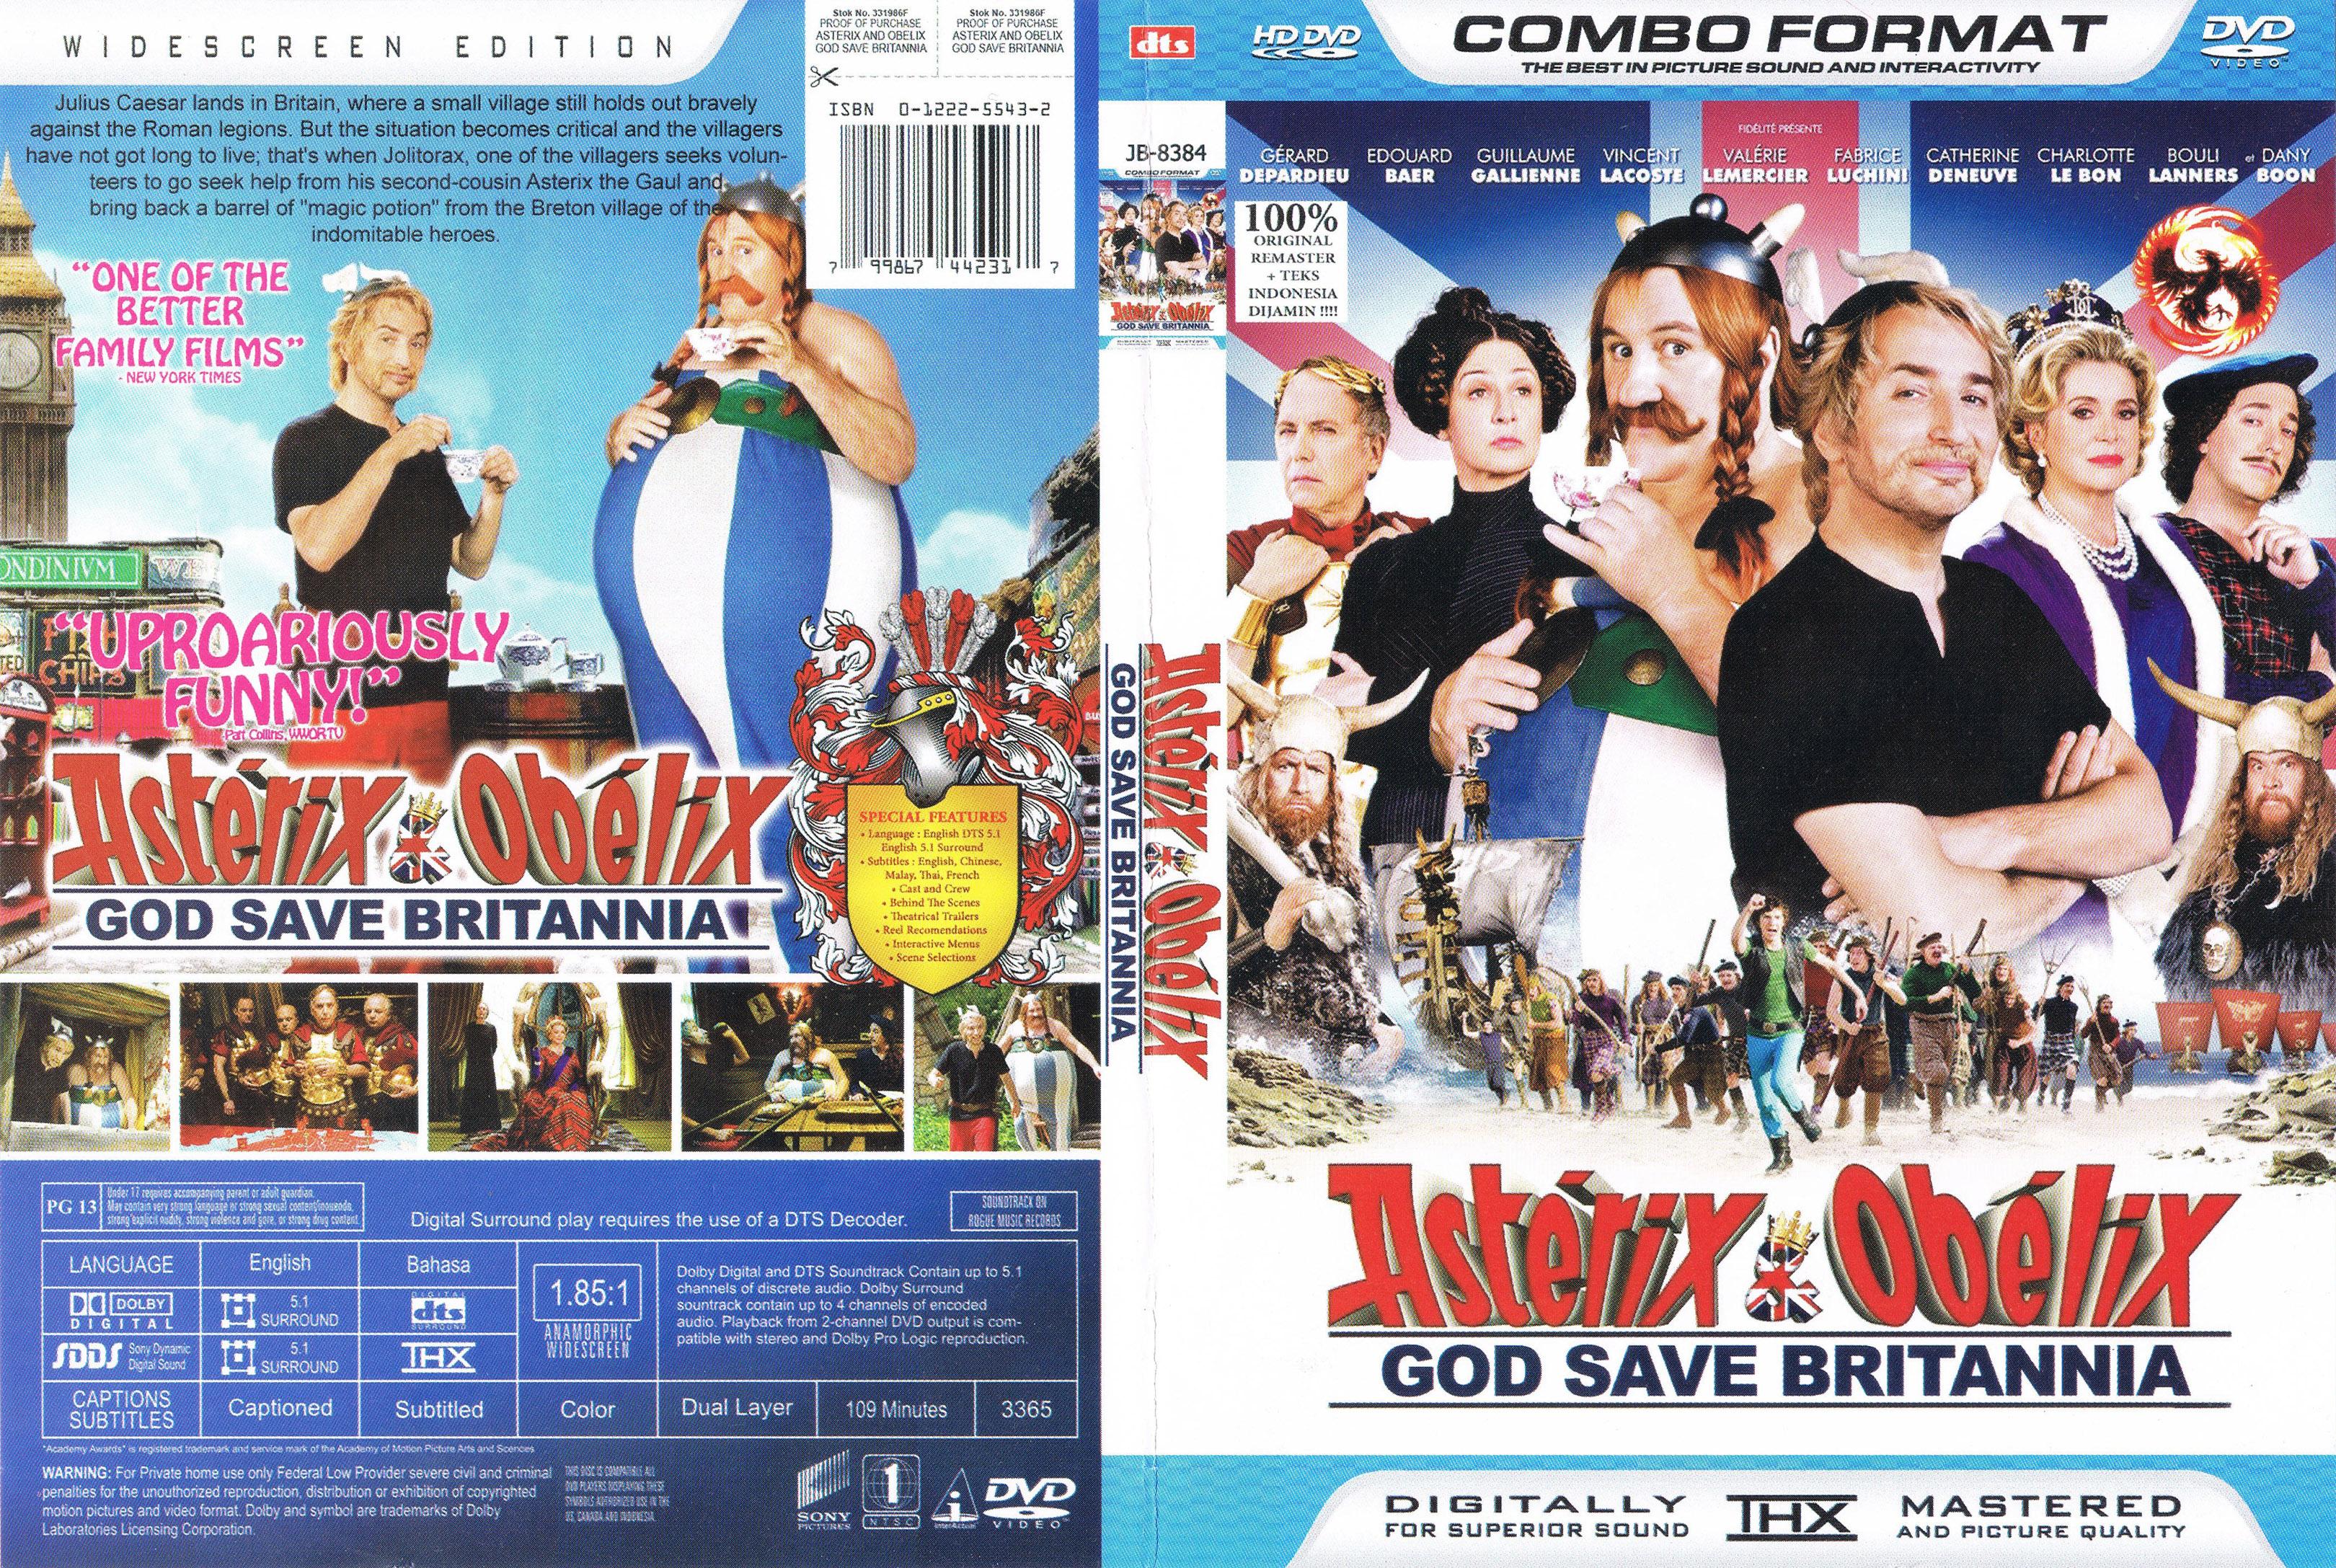 HQ Asterix And Obelix: God Save Britannia Wallpapers | File 3711.11Kb